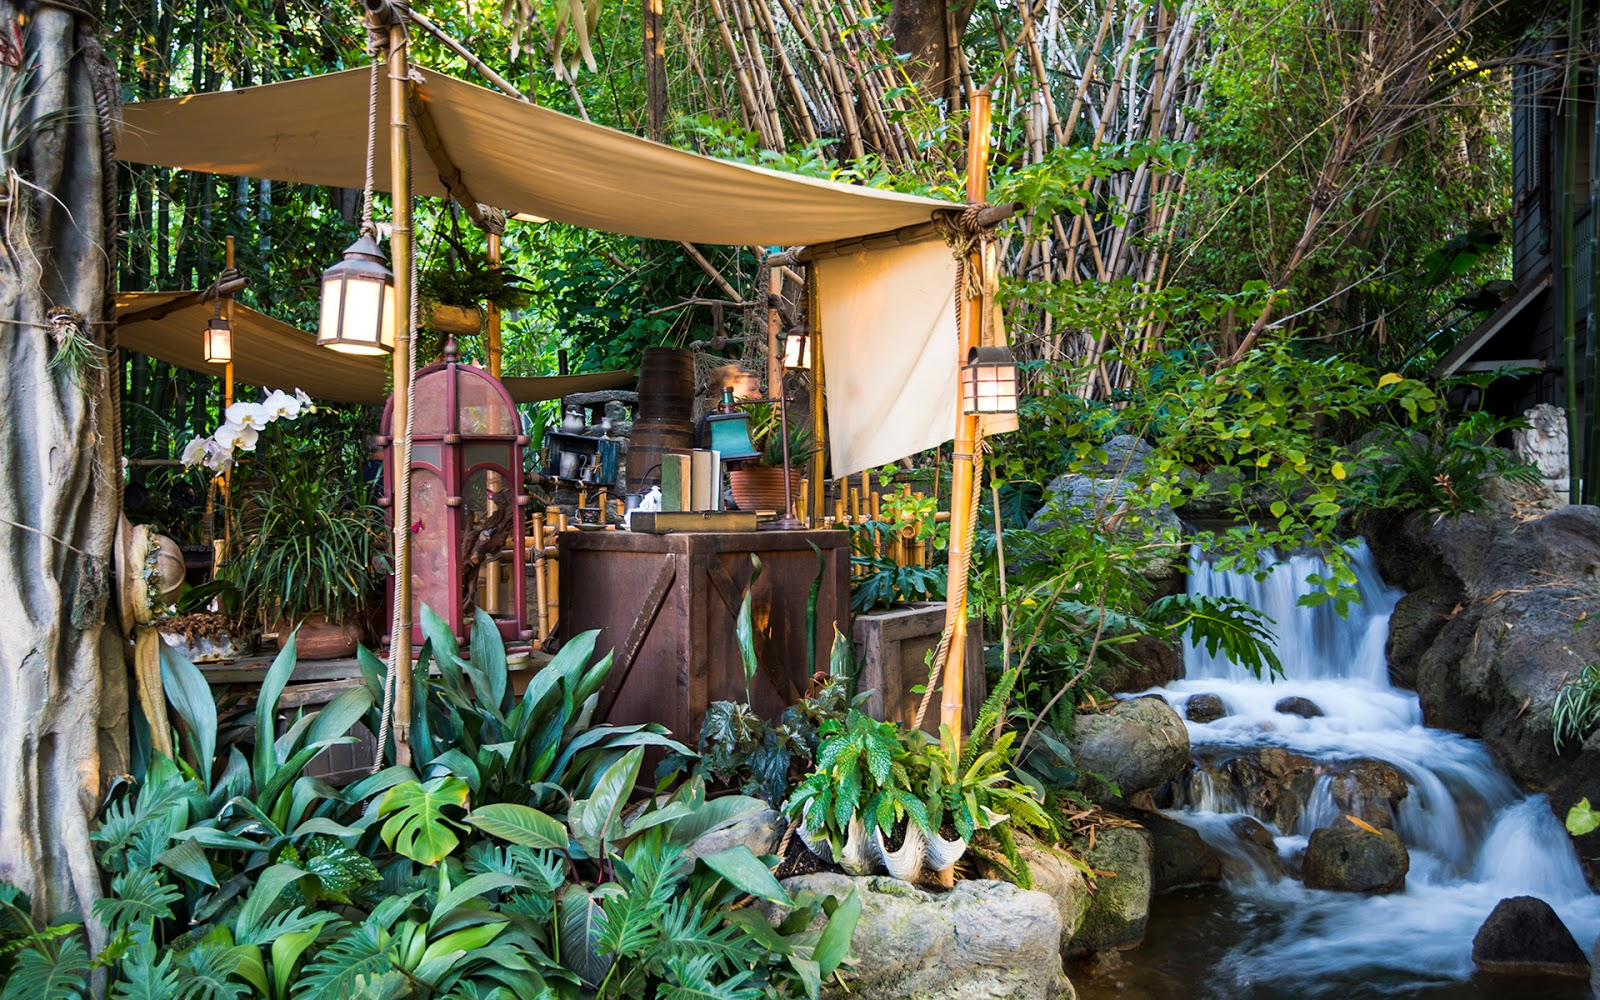 jungle camping -venue: the jungle farm, aswali, bordi for booking, please contact the below mentioned contact numbers  jungle camp on fb jungle camp on fb nature & adventure .